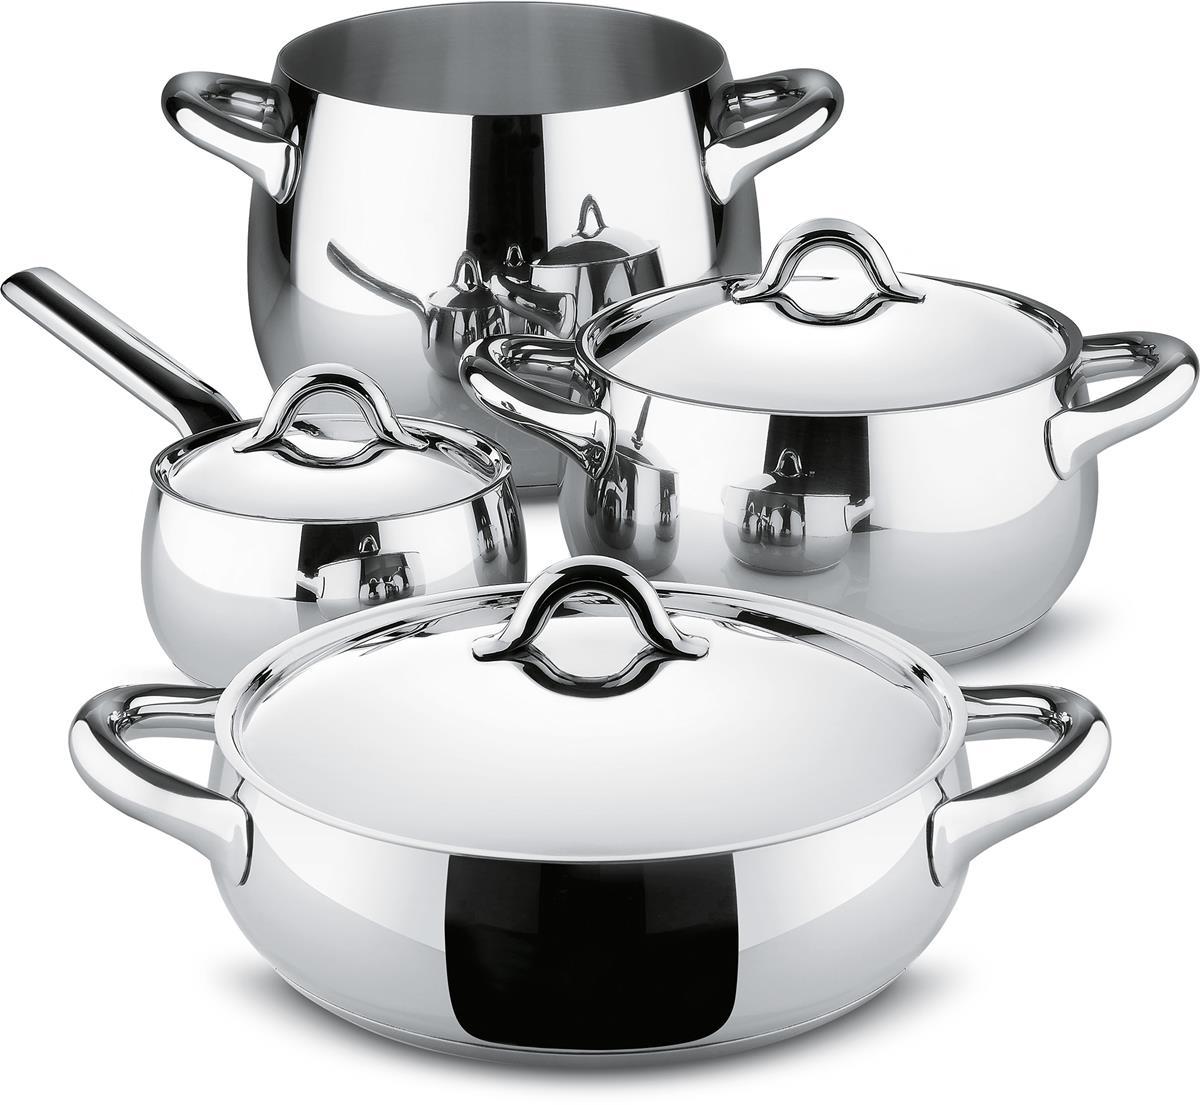 Alessi-7-piece Mami cookware set